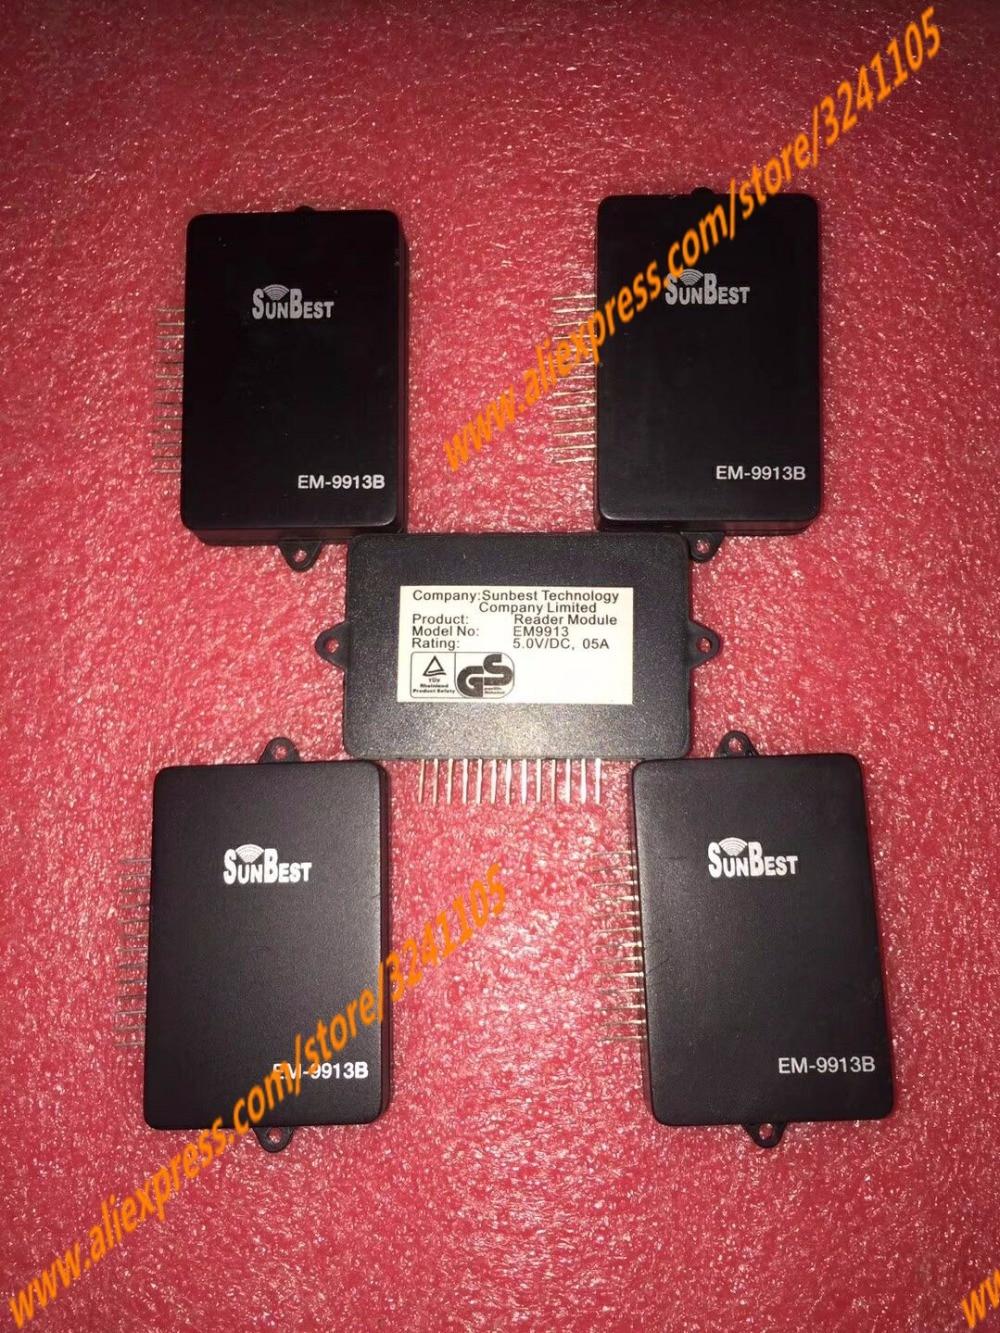 Free shipping NEW EM-9913B MODULE free shipping 20pcs lot rt8205qw rt8205l em da em db em dj qfn laptop chips 100% new original quality assurance